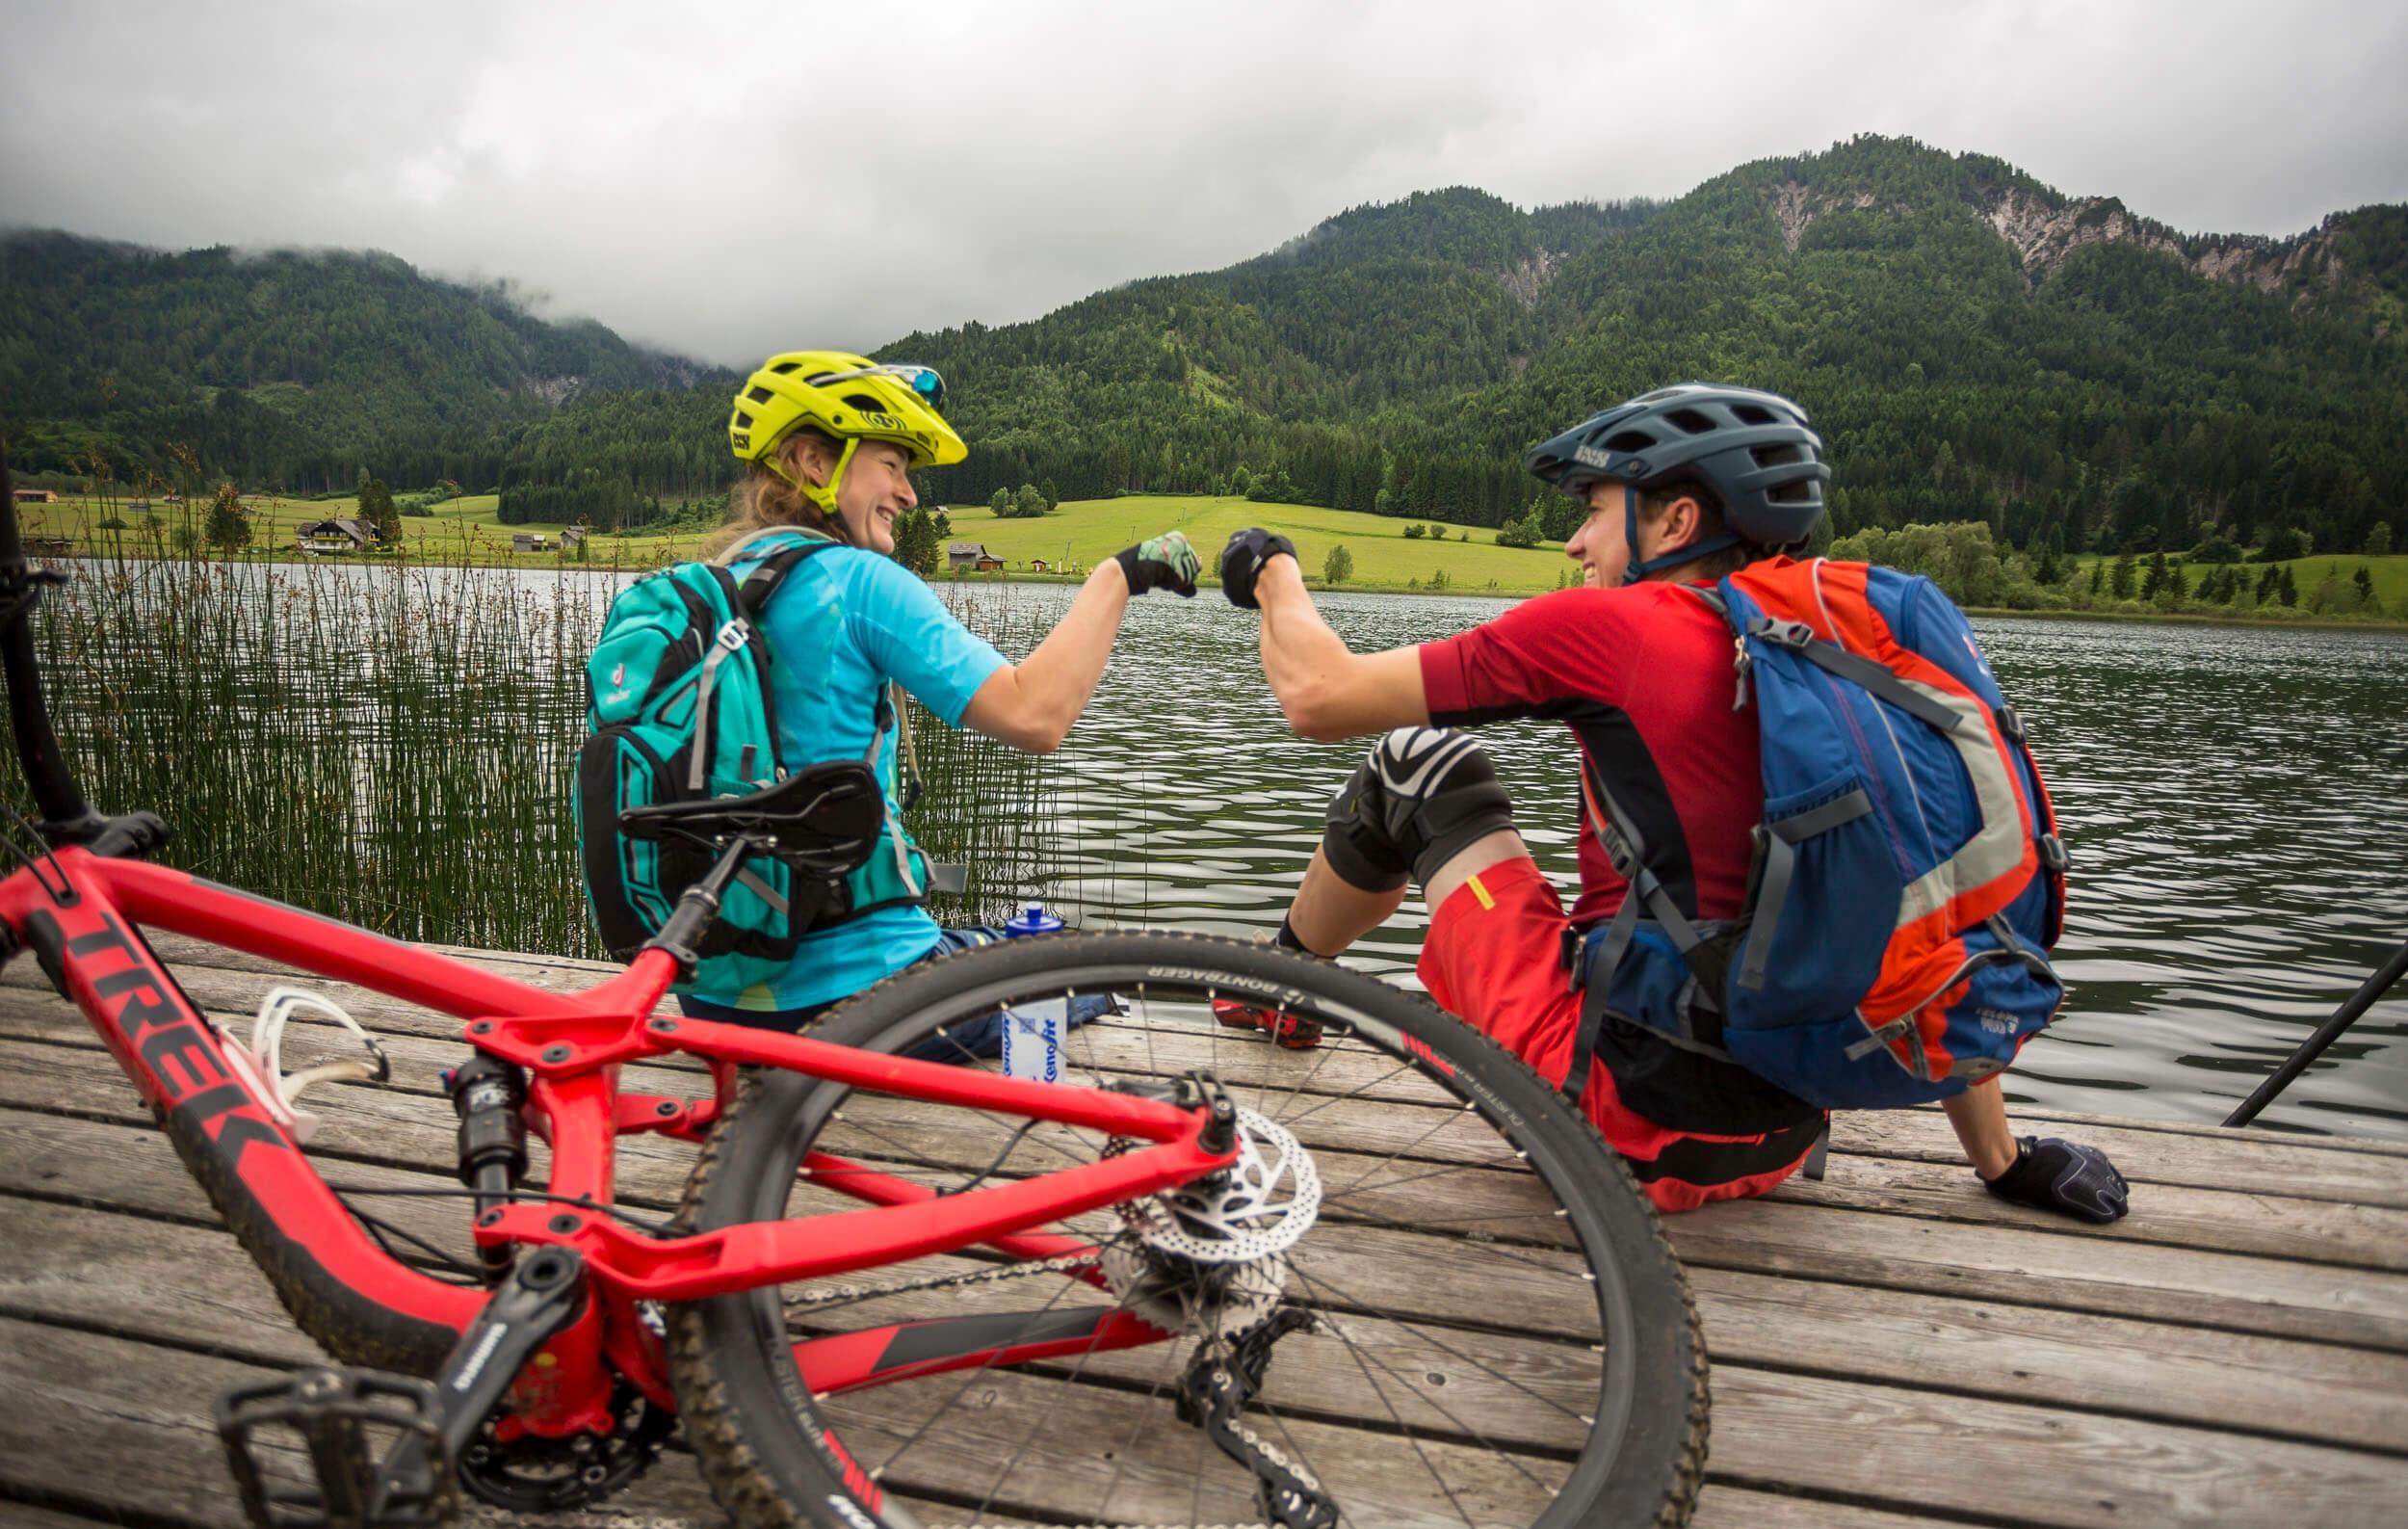 Biker-Pause am Weissensee in Kärnten © WOM Medien